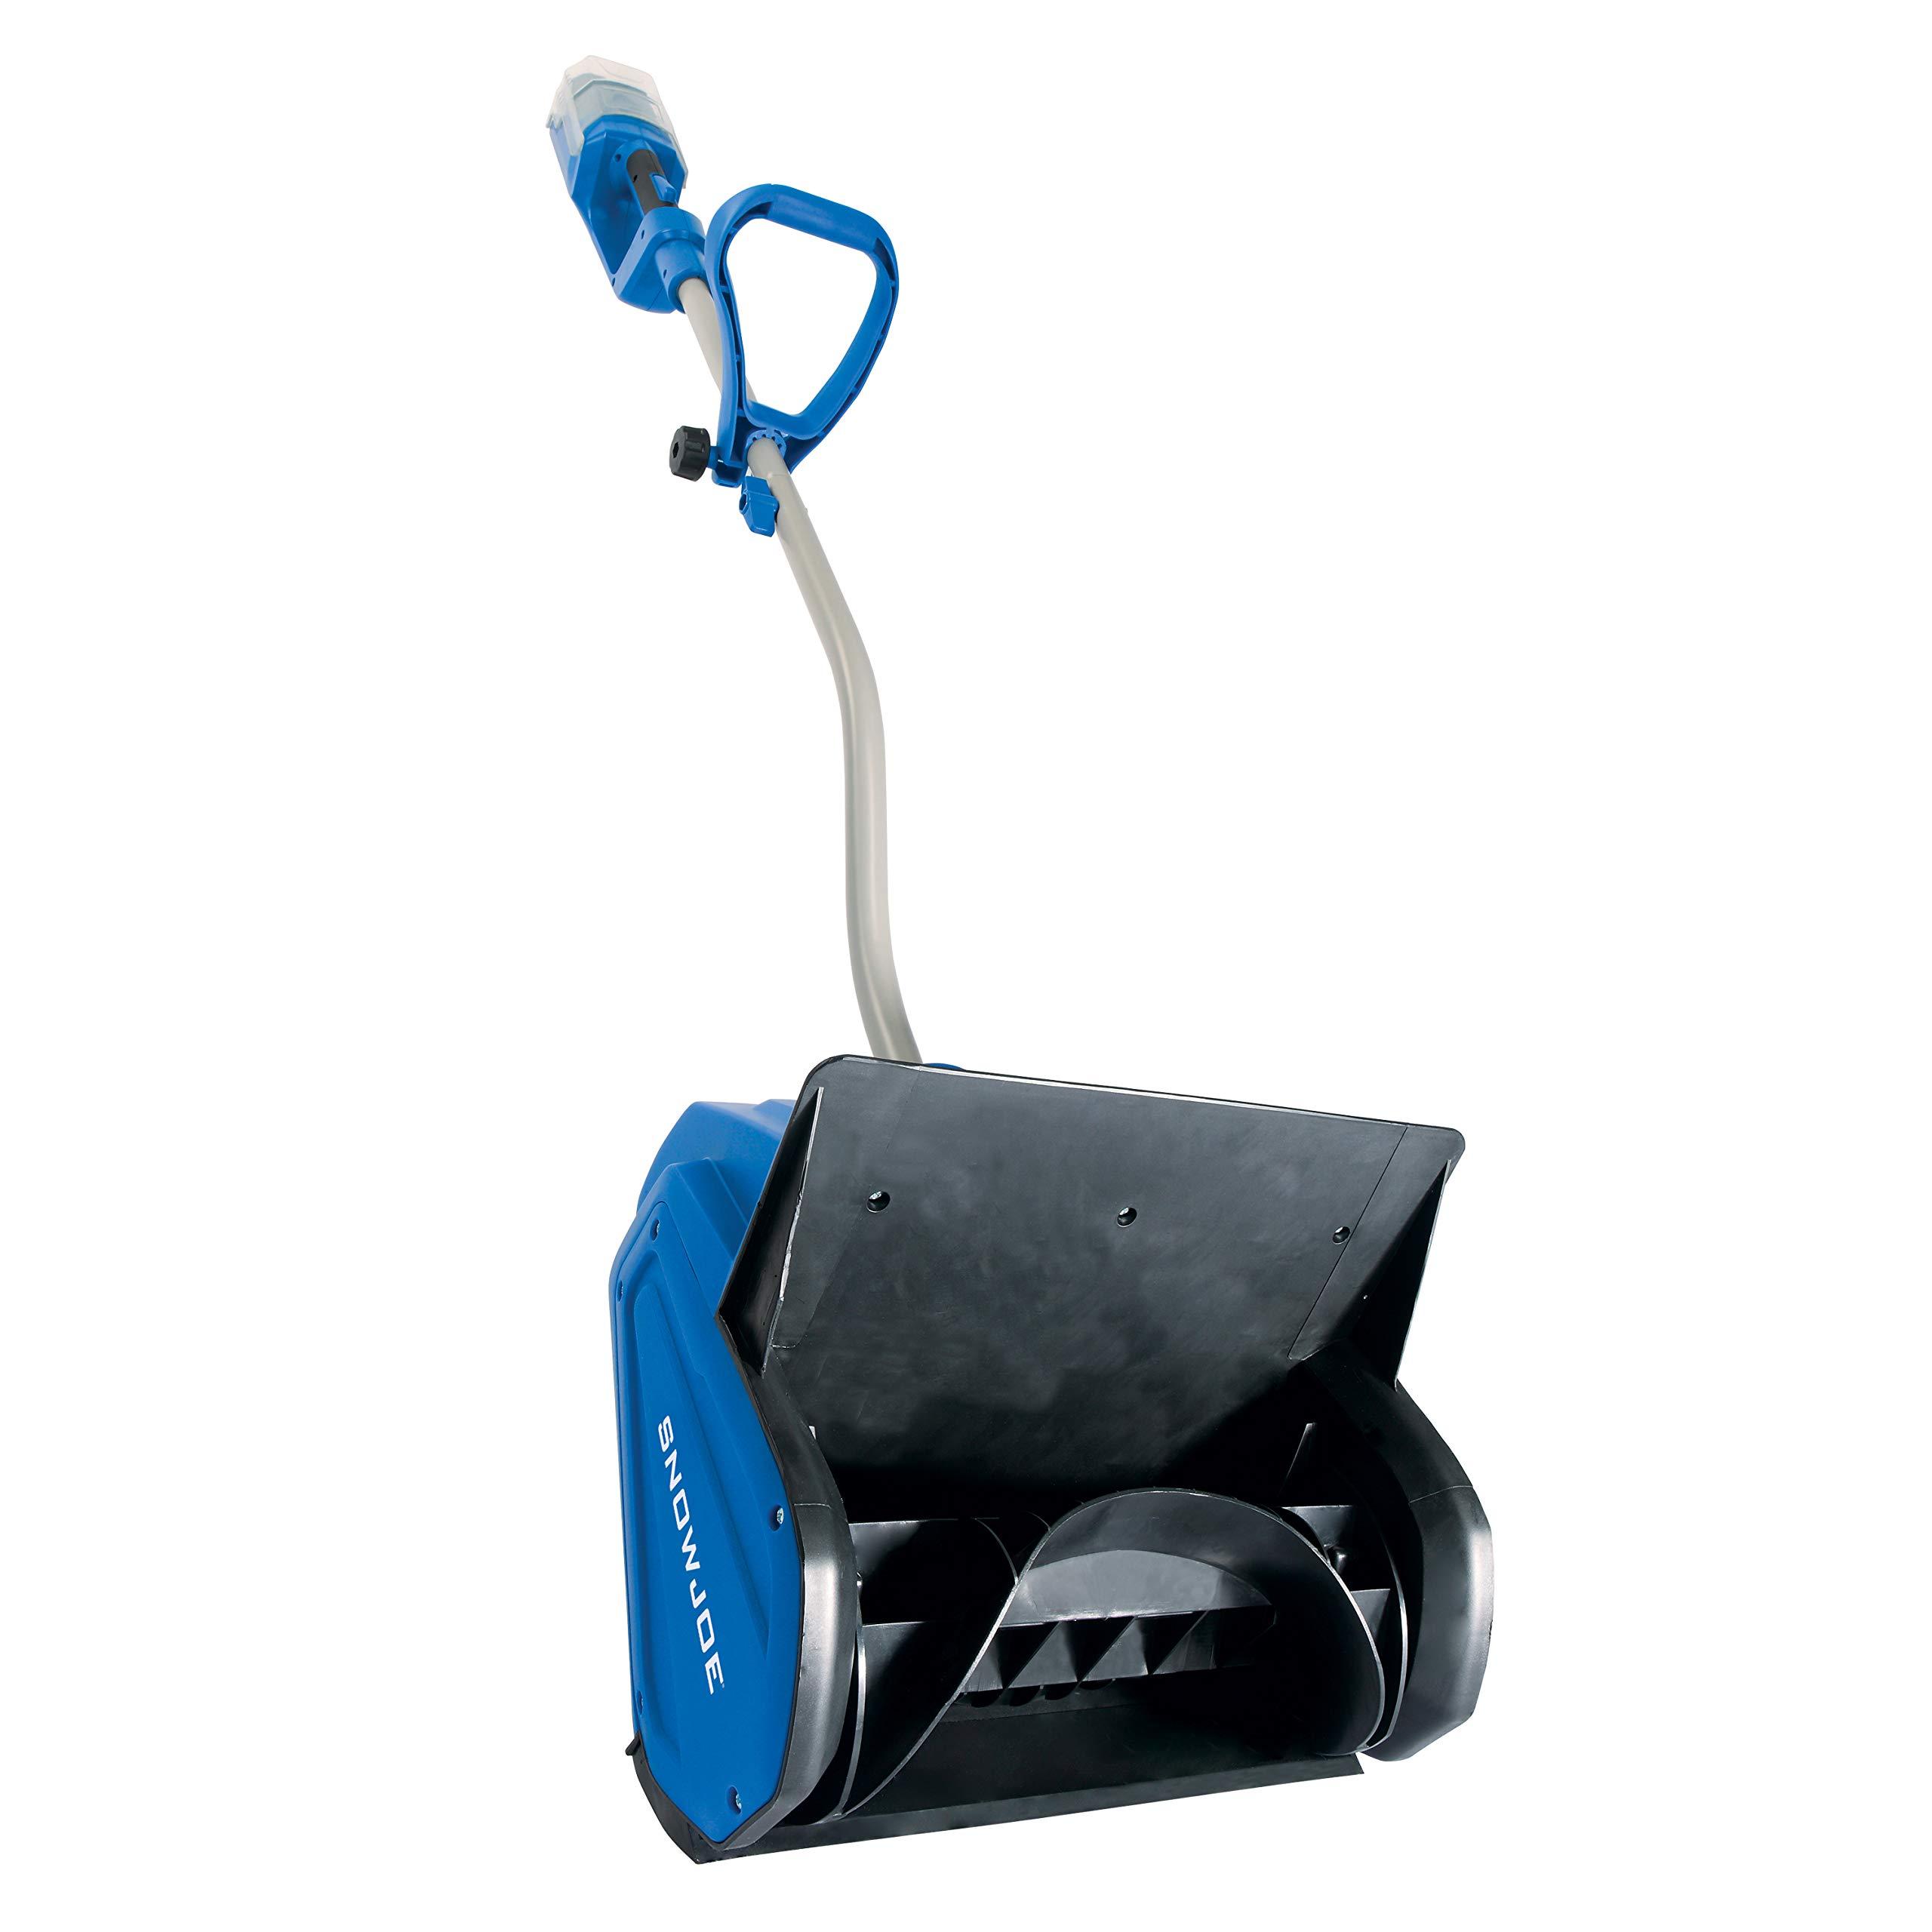 Snow Joe, LLC. ION13SS-CT 13-Inch 40 Volt Cordless Snow Shovel, Core Tool (No Battery or Charger) by Snow Joe